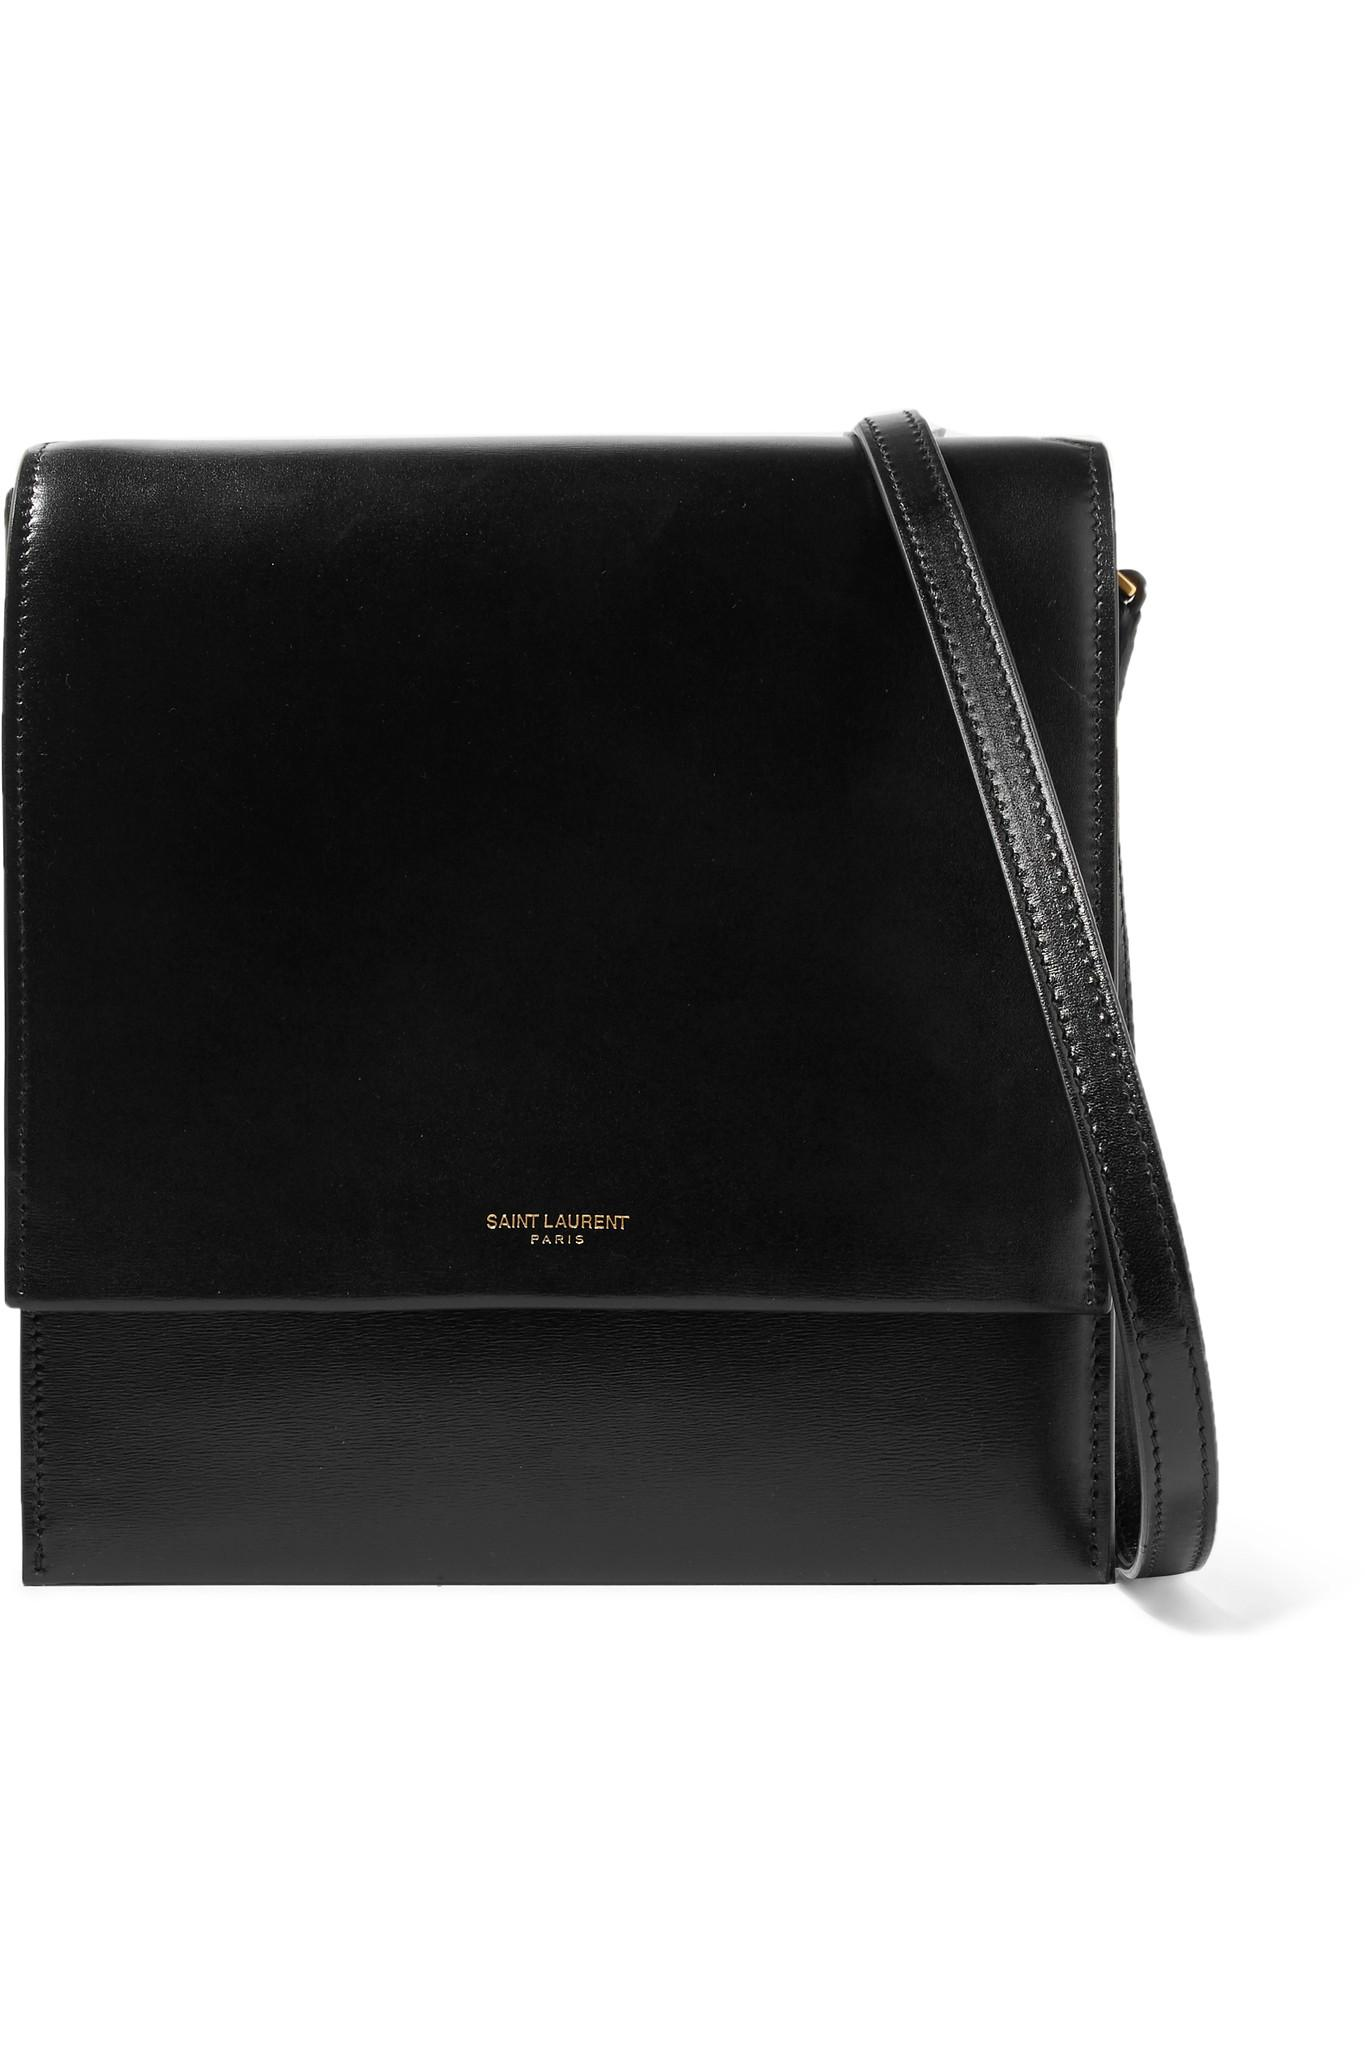 9bf5c58e89 Saint Laurent - Black Sao Leather Shoulder Bag - Lyst. View fullscreen